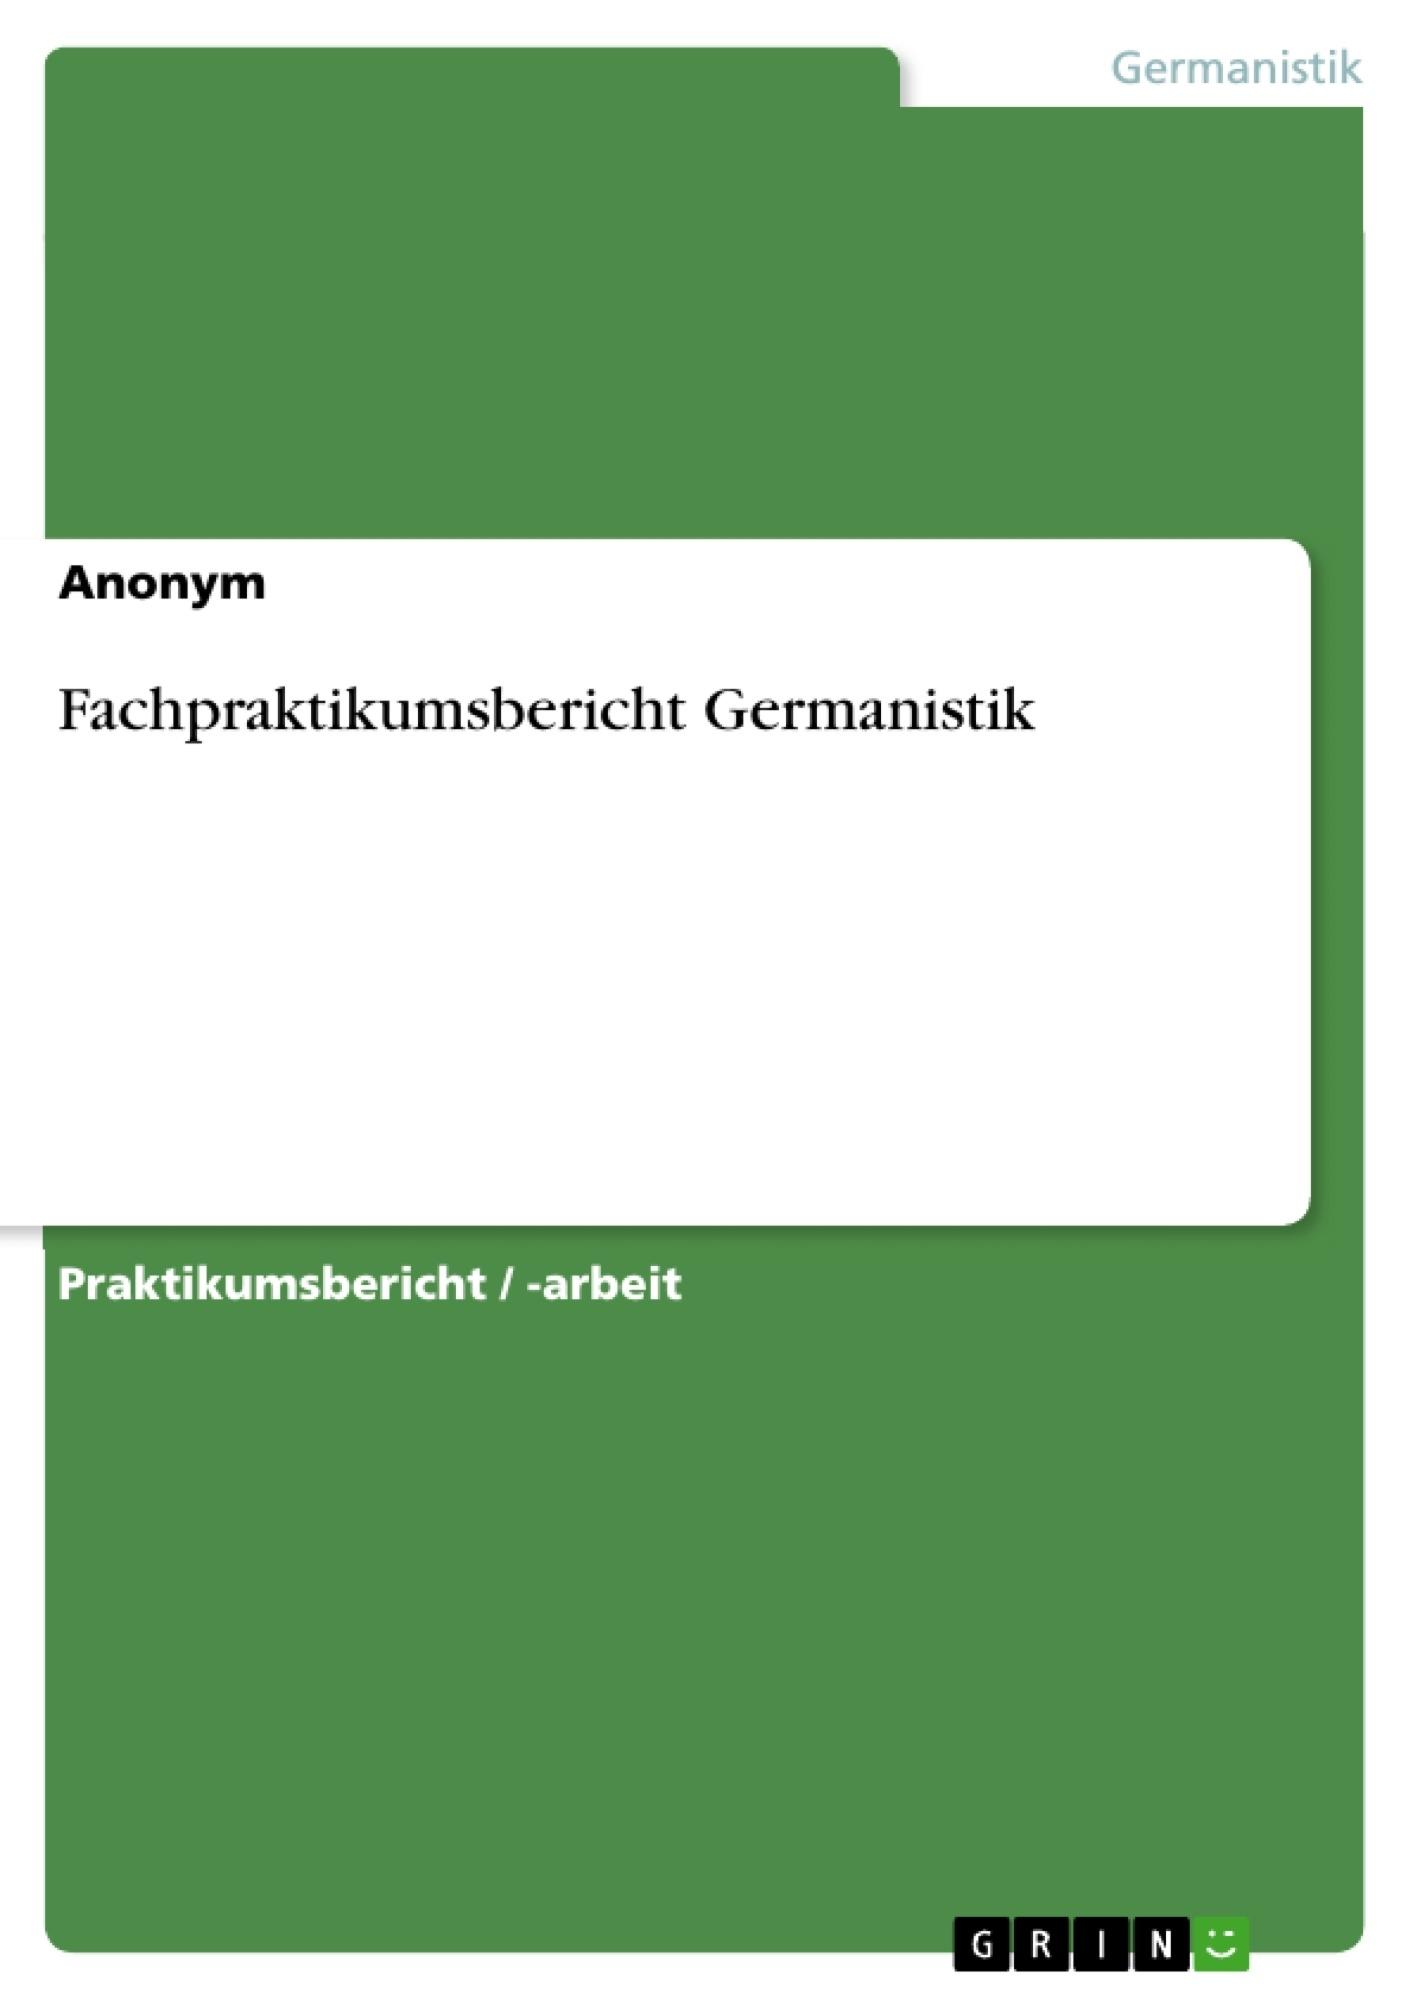 Titel: Fachpraktikumsbericht Germanistik